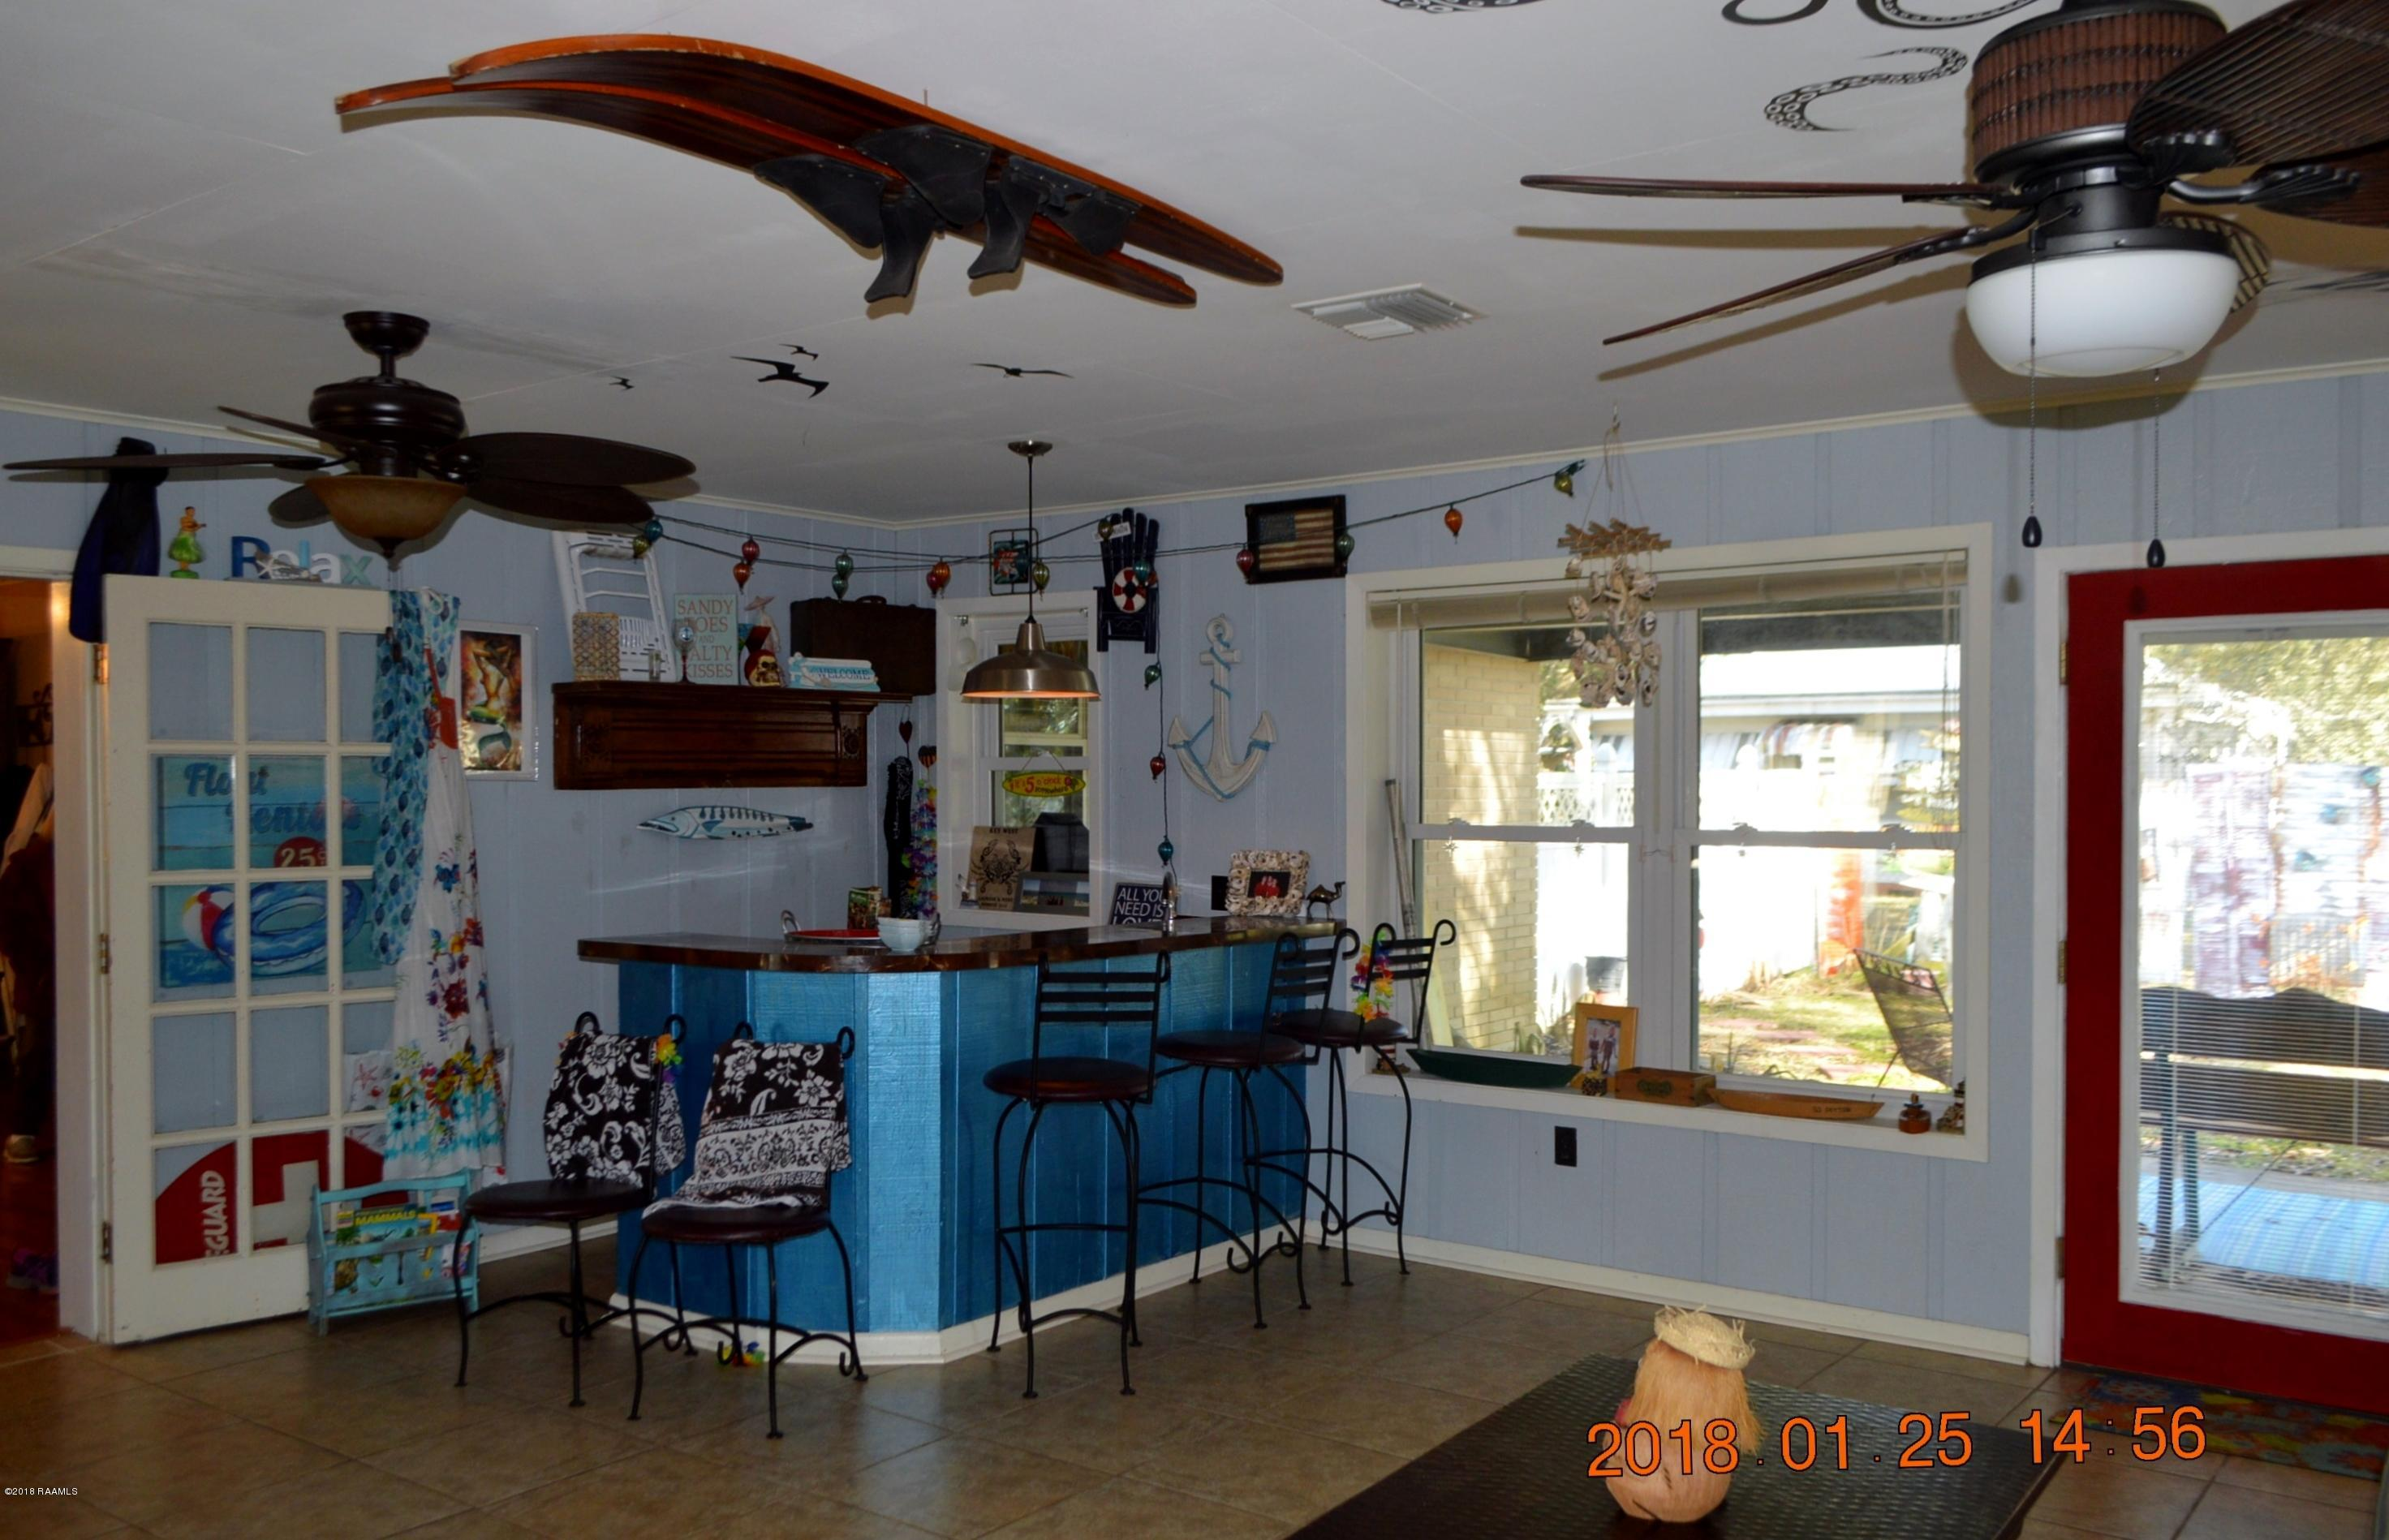 115 Perkins Street, St. Martinville, LA 70582 Photo #12